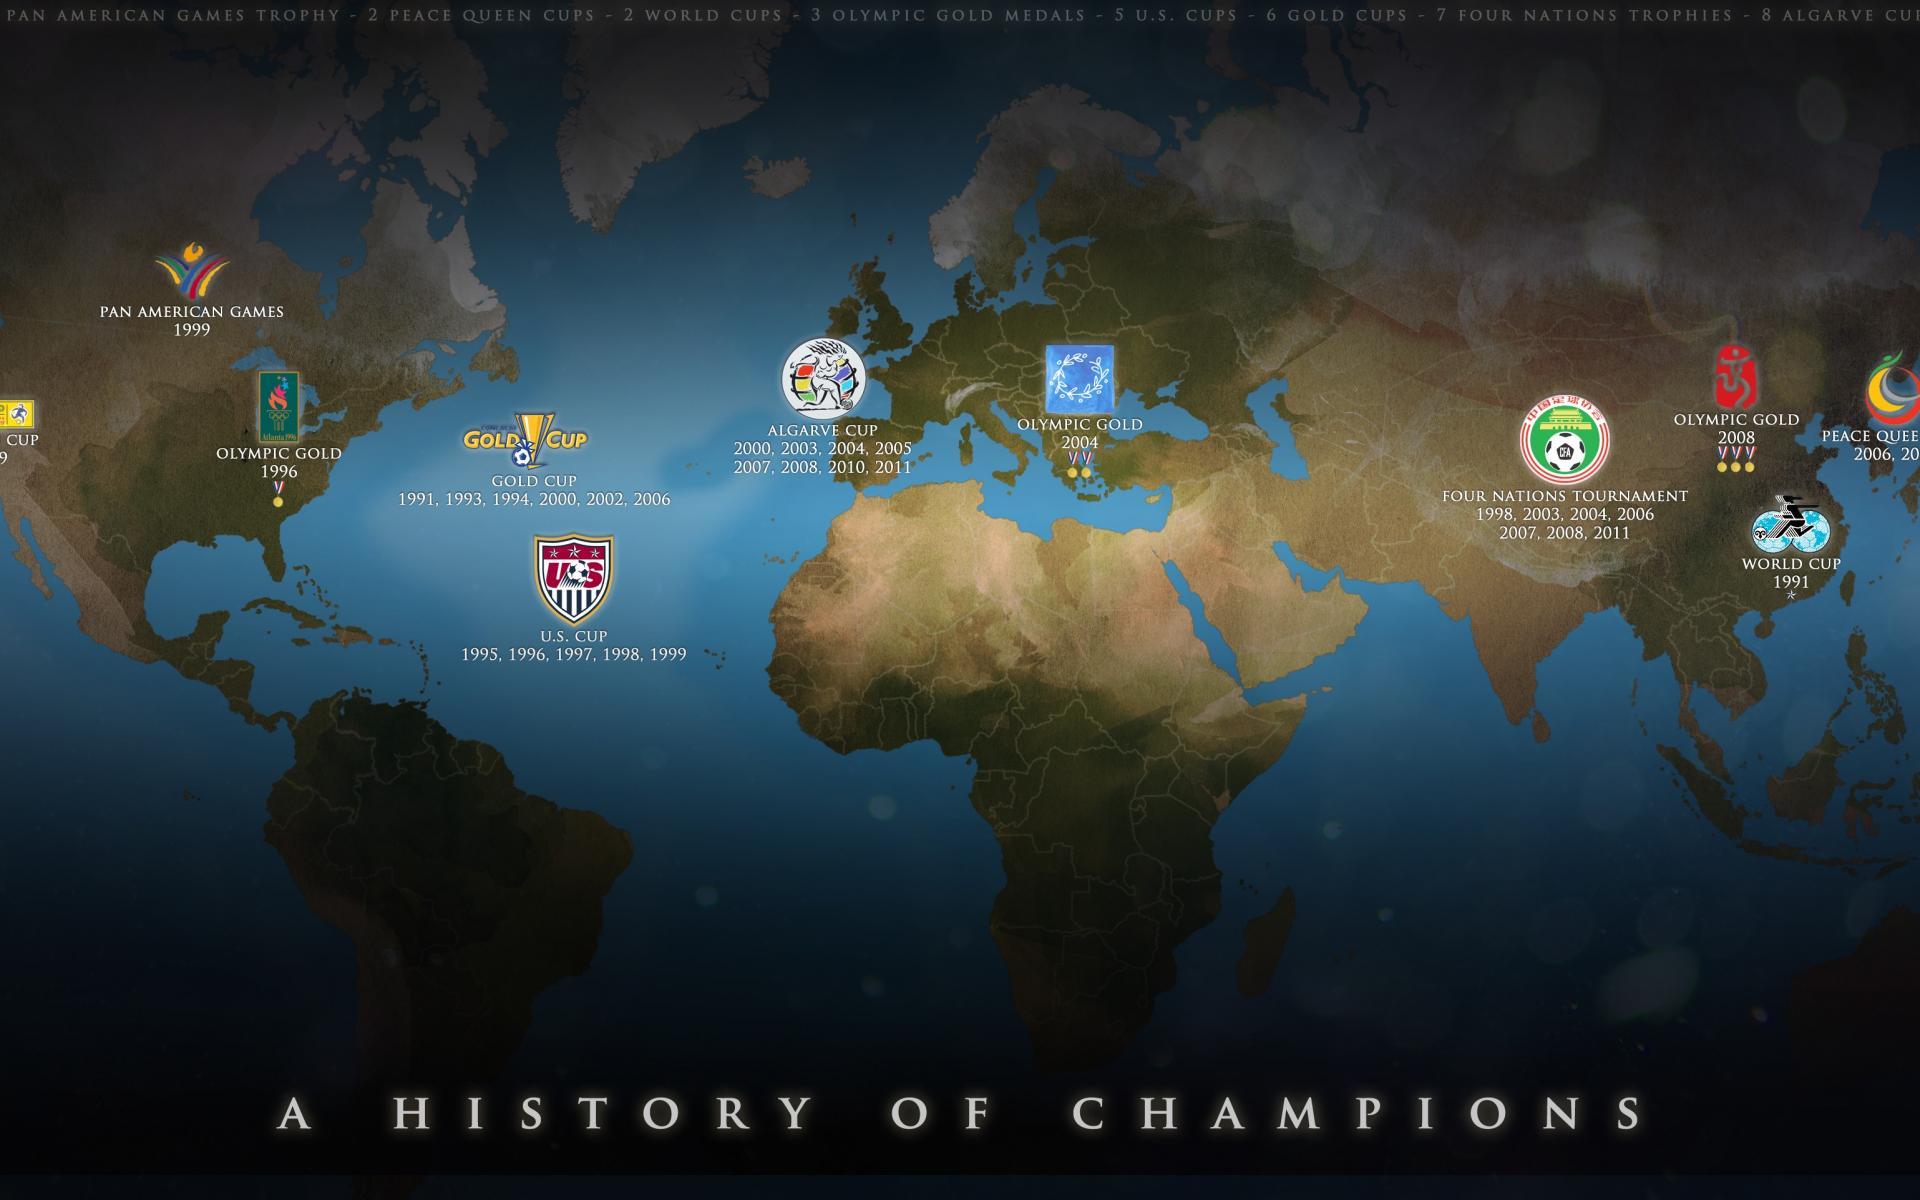 History champions uswnt us soccer wallpaper 32995 1920x1200